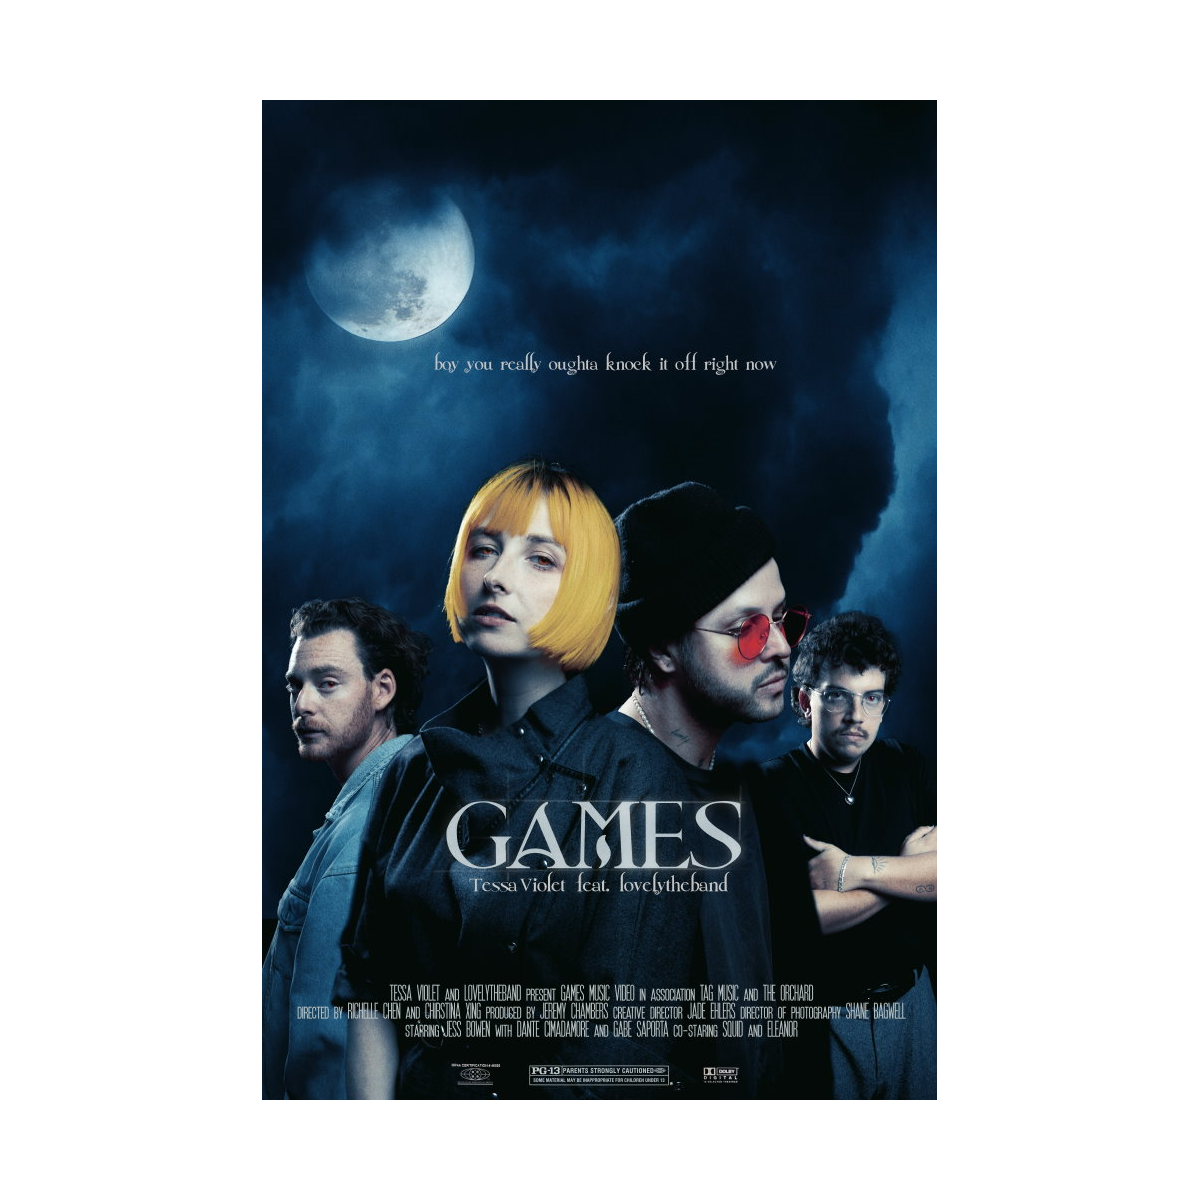 Games Poster (Feat. Lovelytheband)